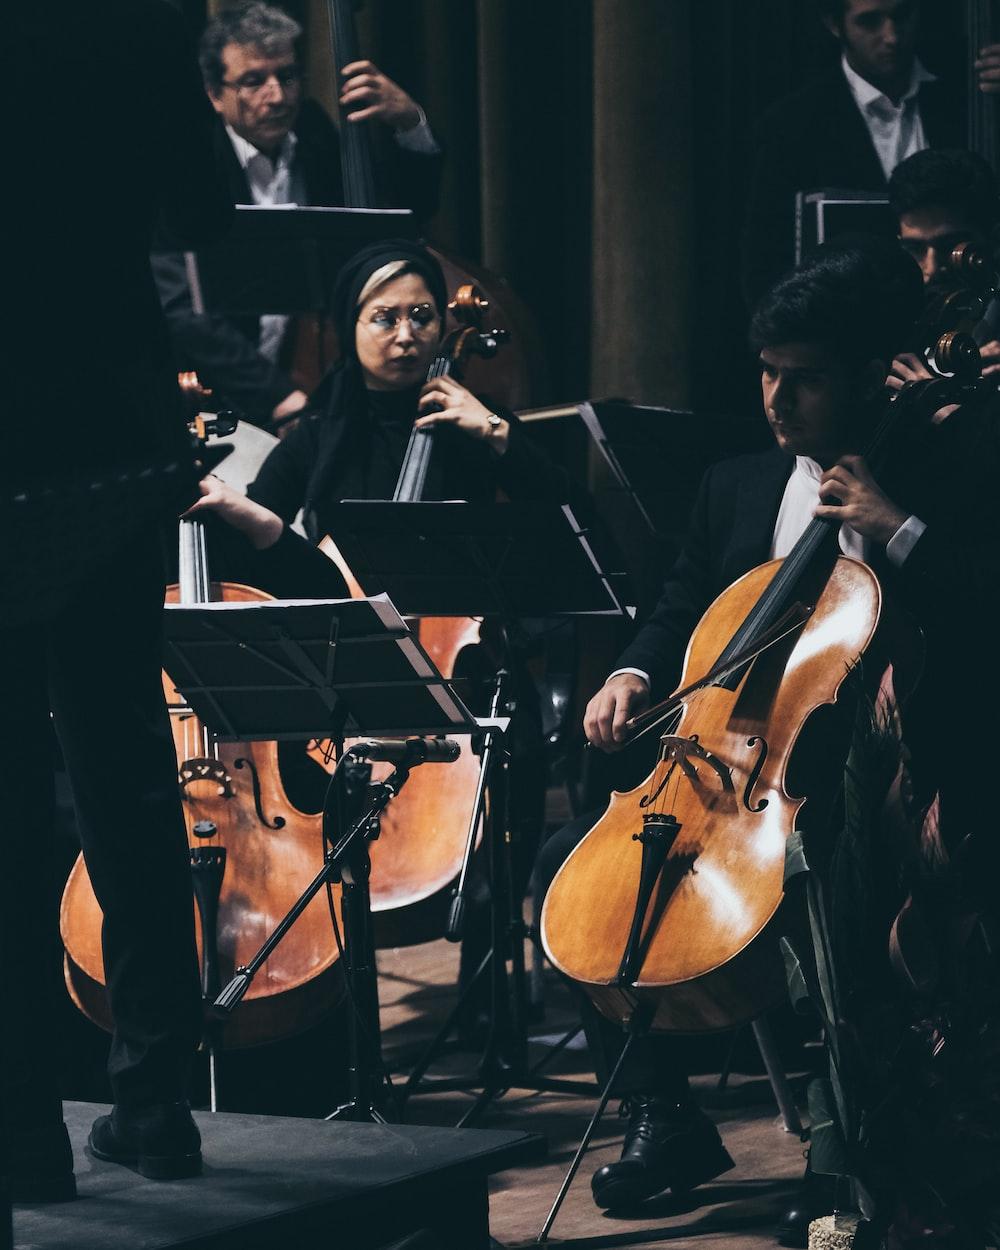 woman in black dress playing violin